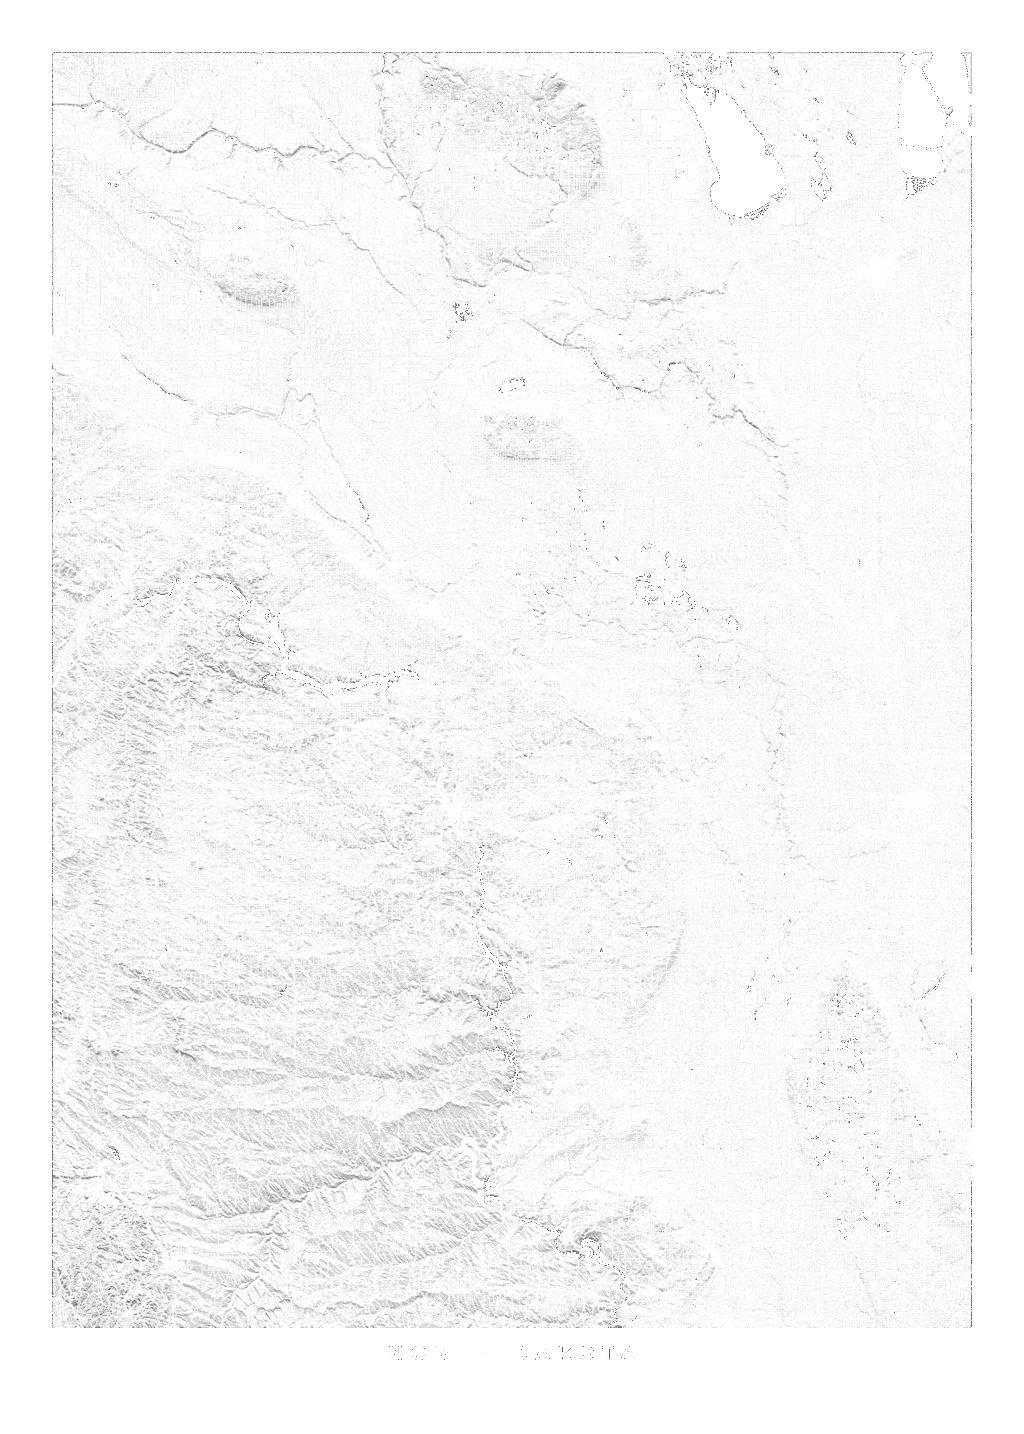 North Dakota wall map